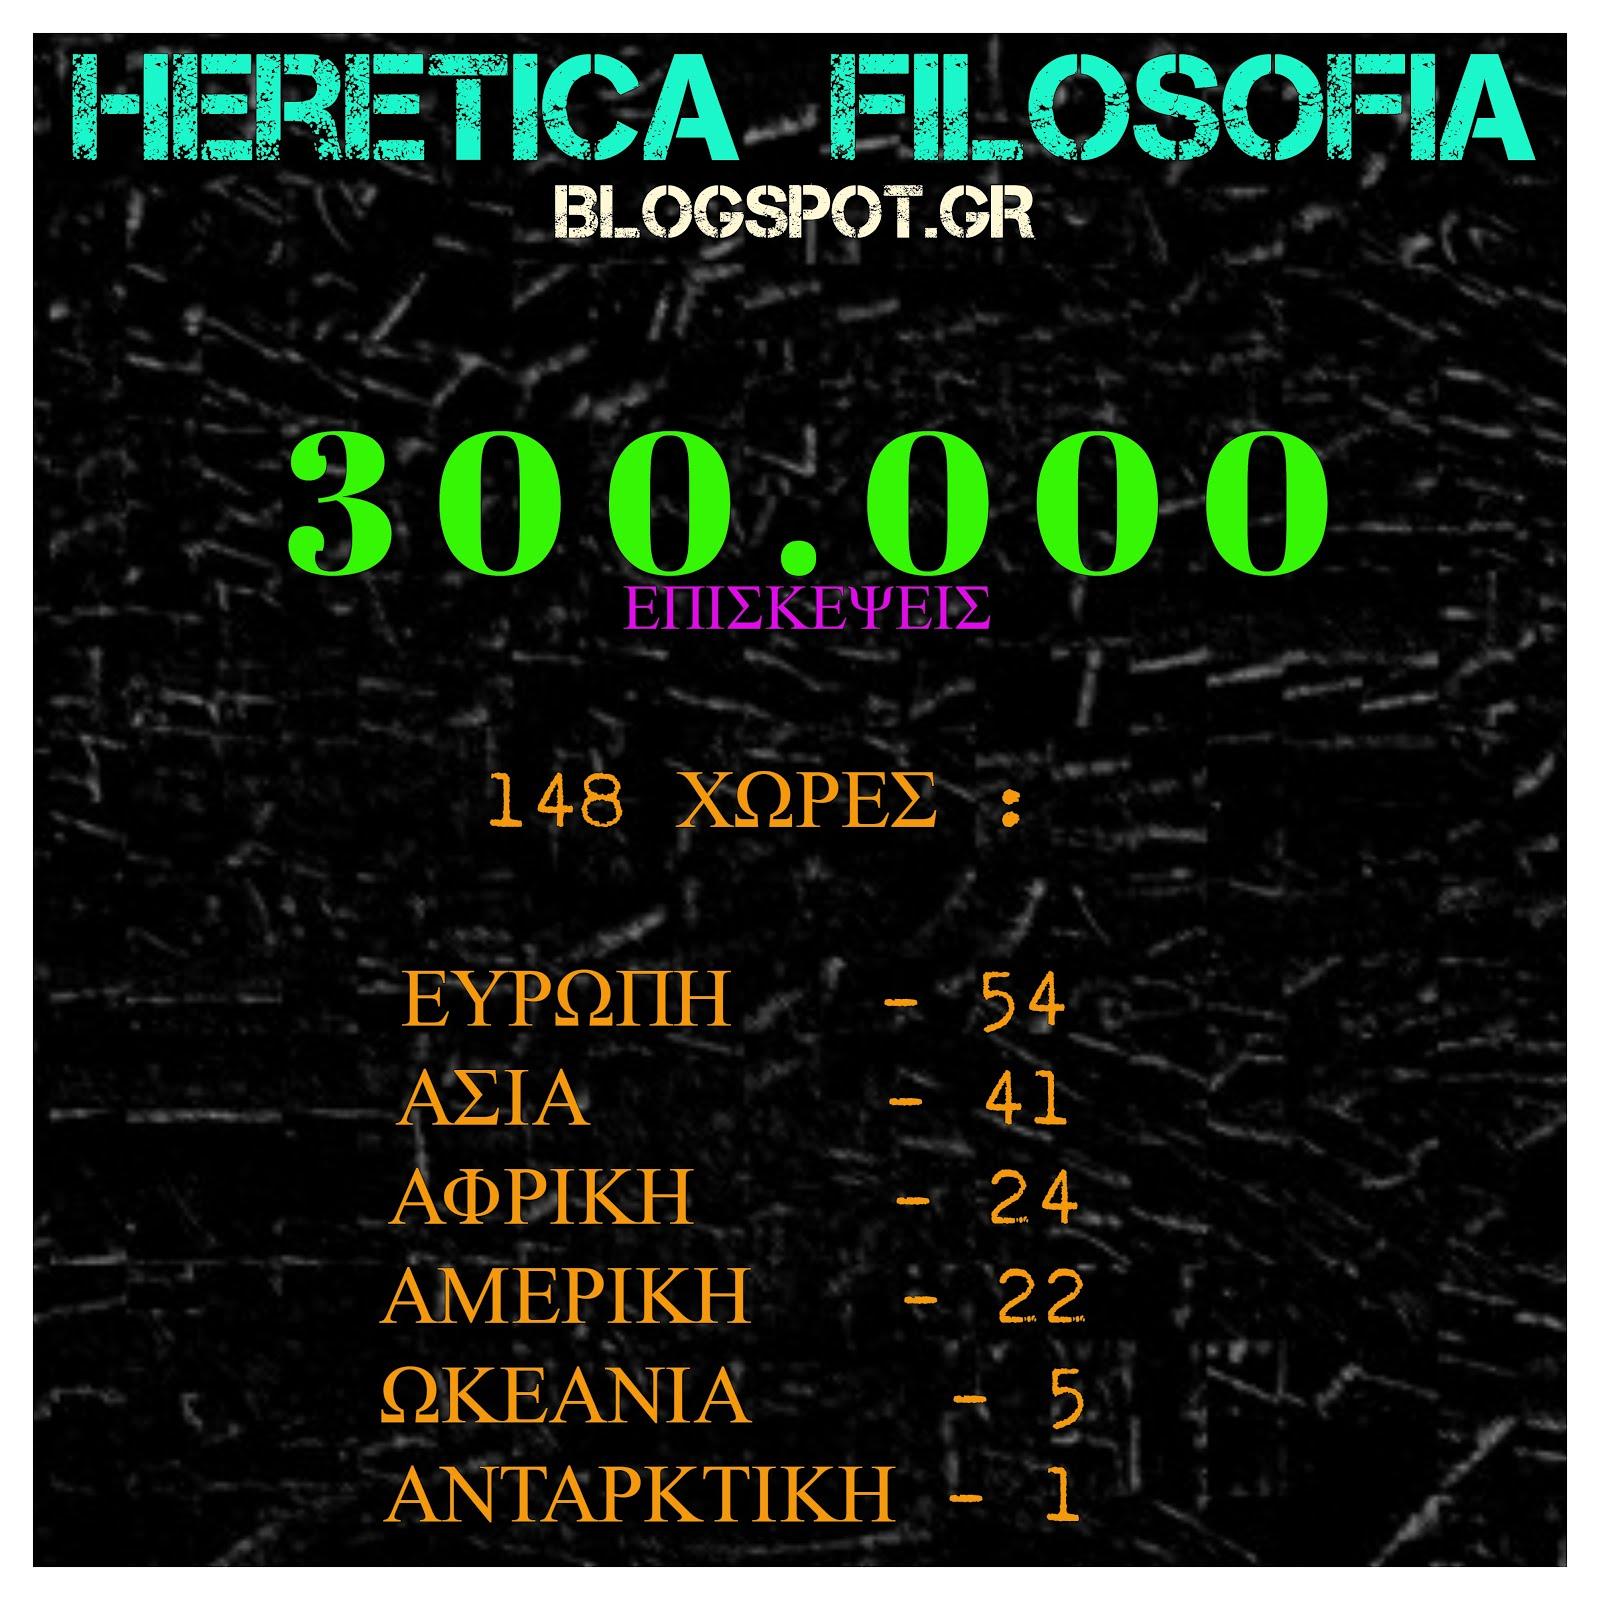 hereticafilisofia.blogspot.g